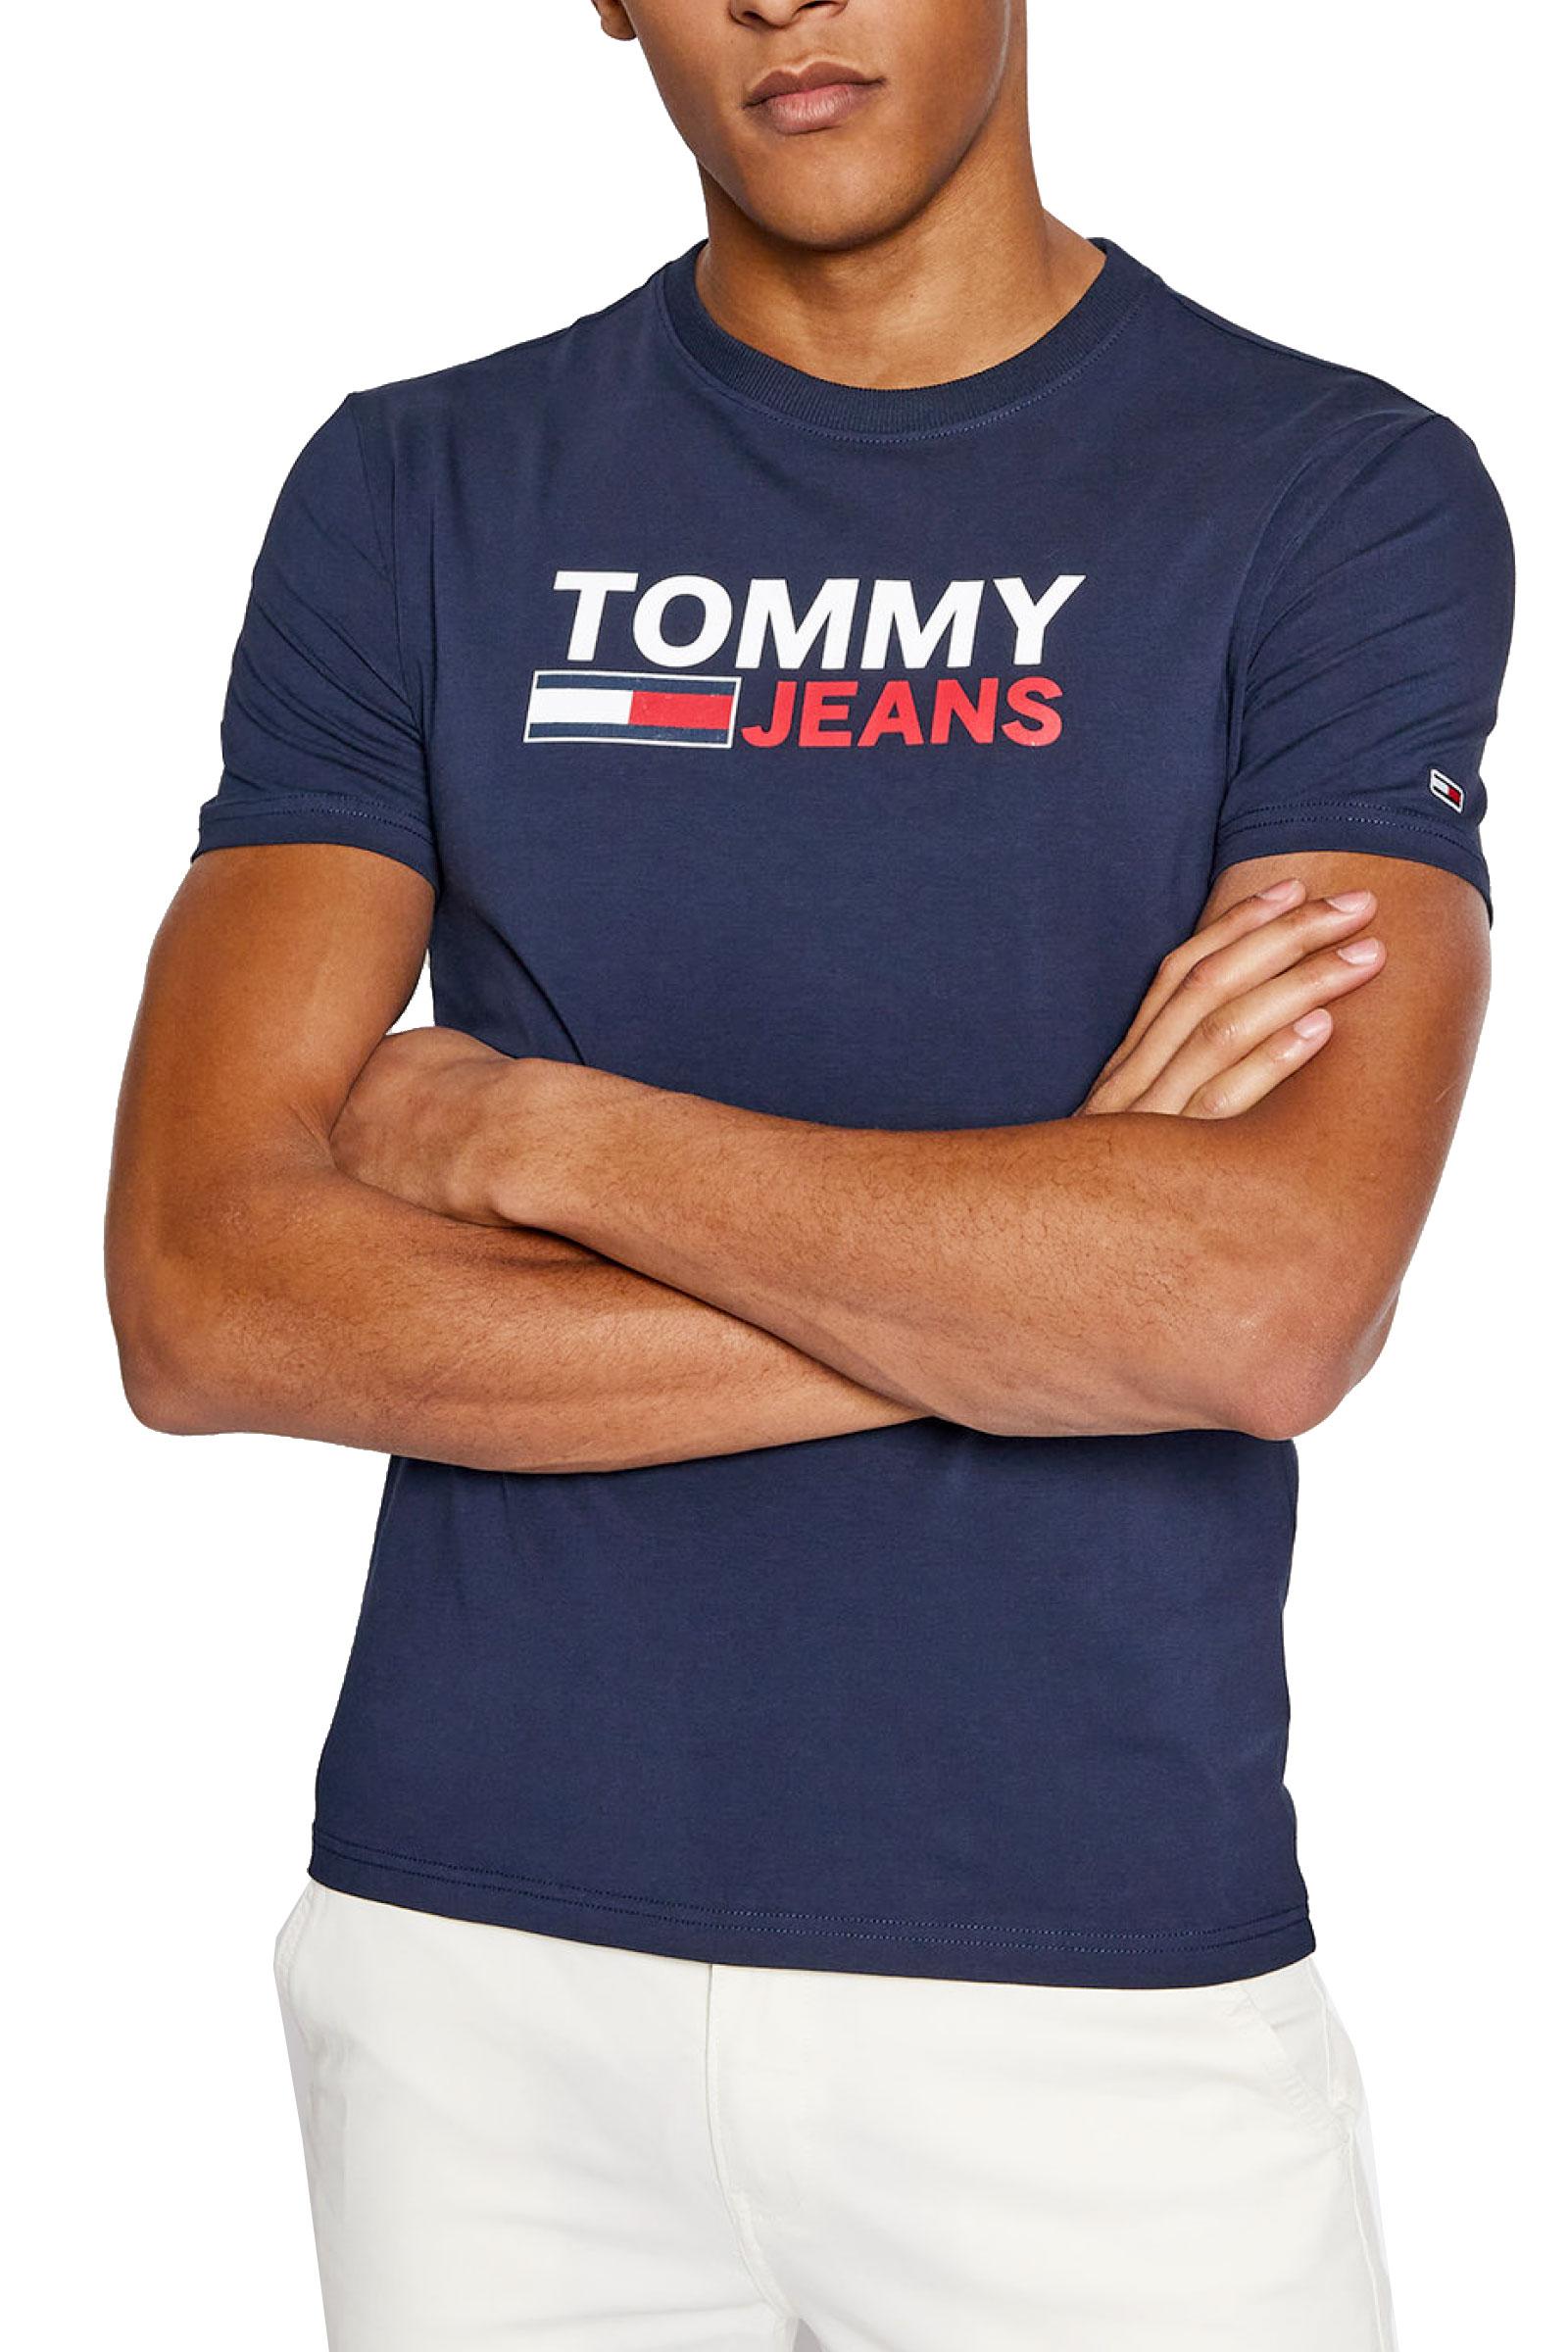 TOMMY JEANS T-Shirt Uomo TOMMY JEANS | T-Shirt | DM0DM10626C87